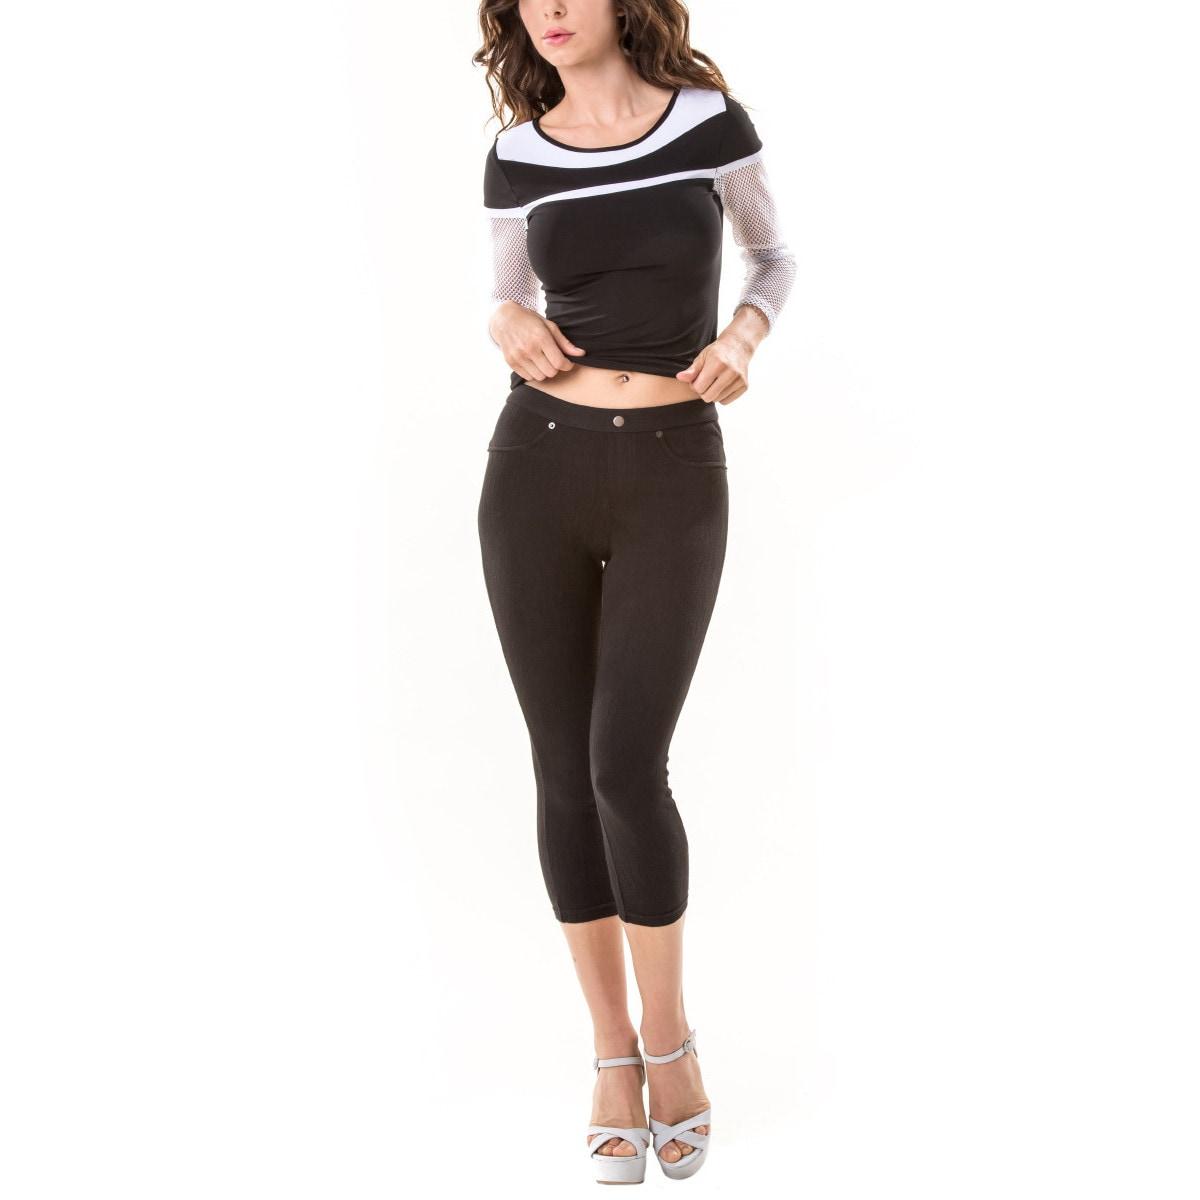 8ec0c0d8094a86 Details about Memoi Women's Chino Capri Legging